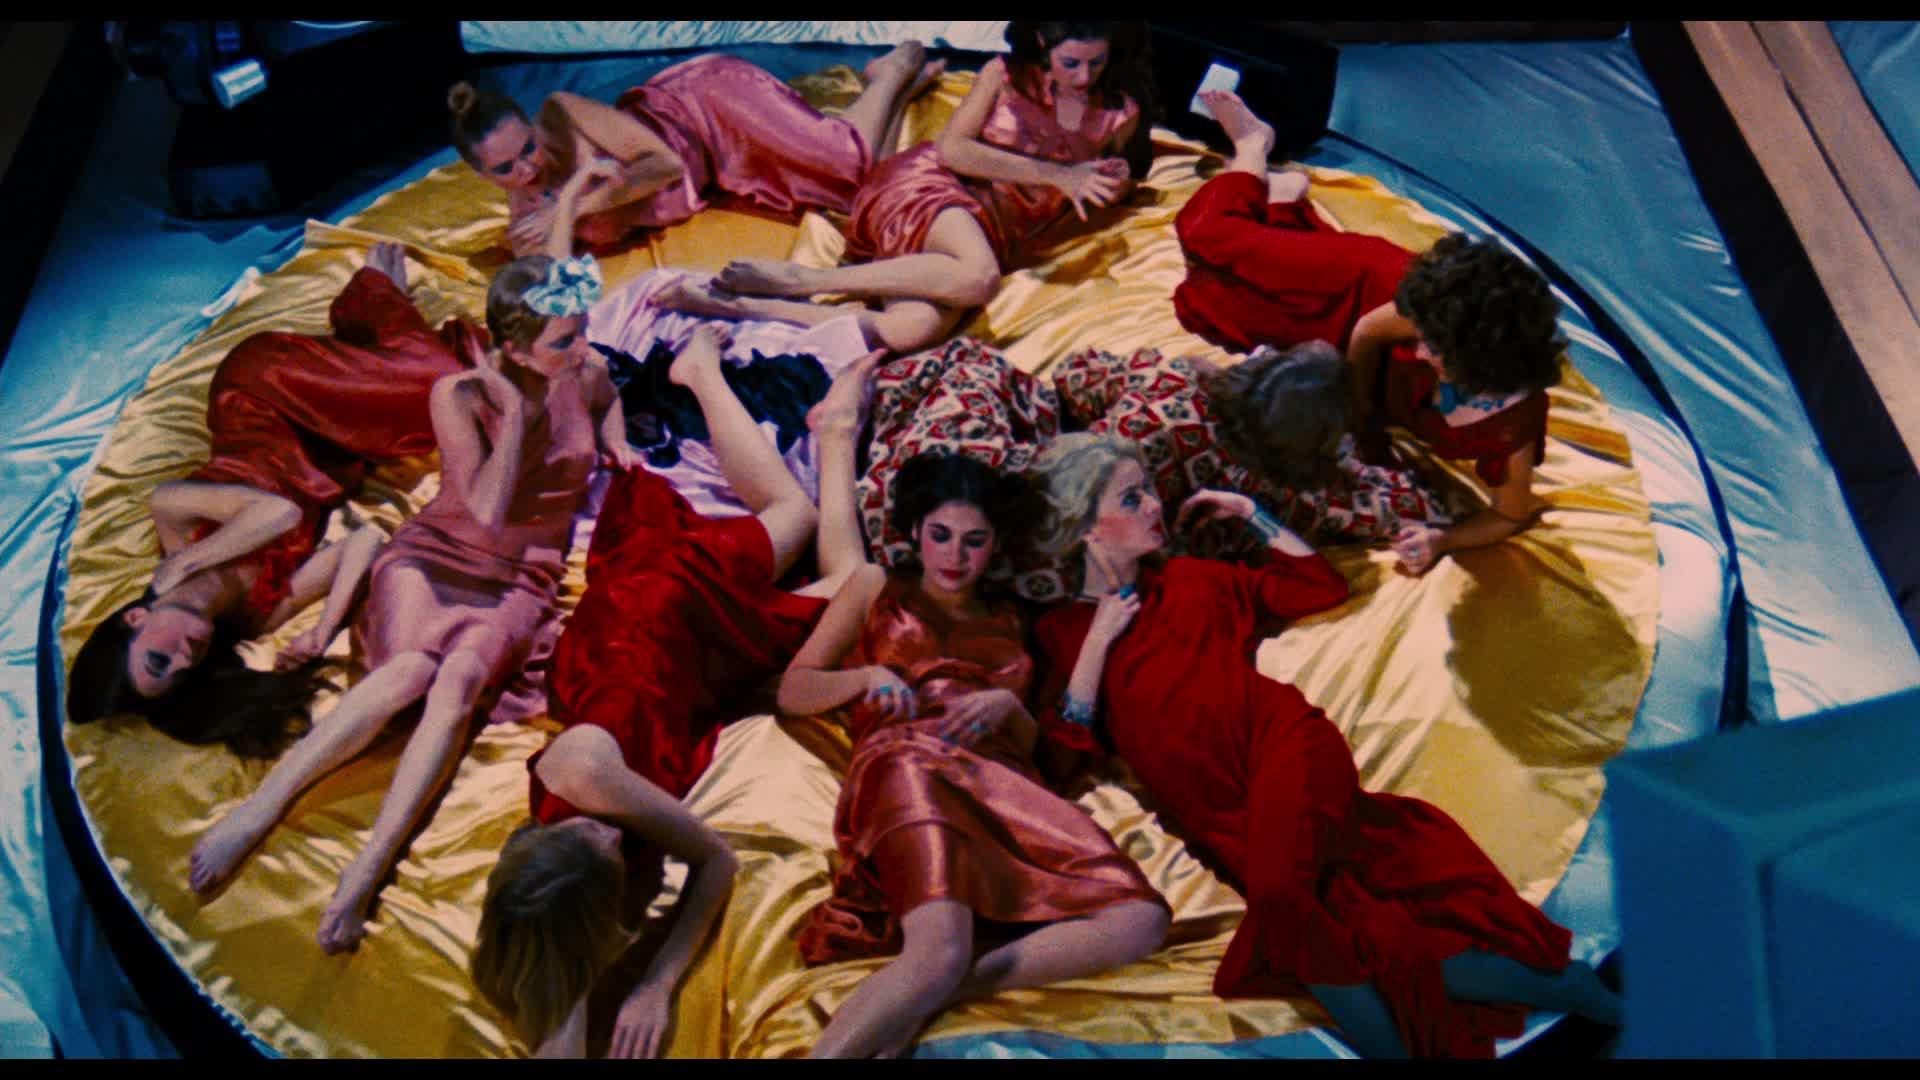 Phantom-of-the-Paradise-Blu-ray-Screenshot-005